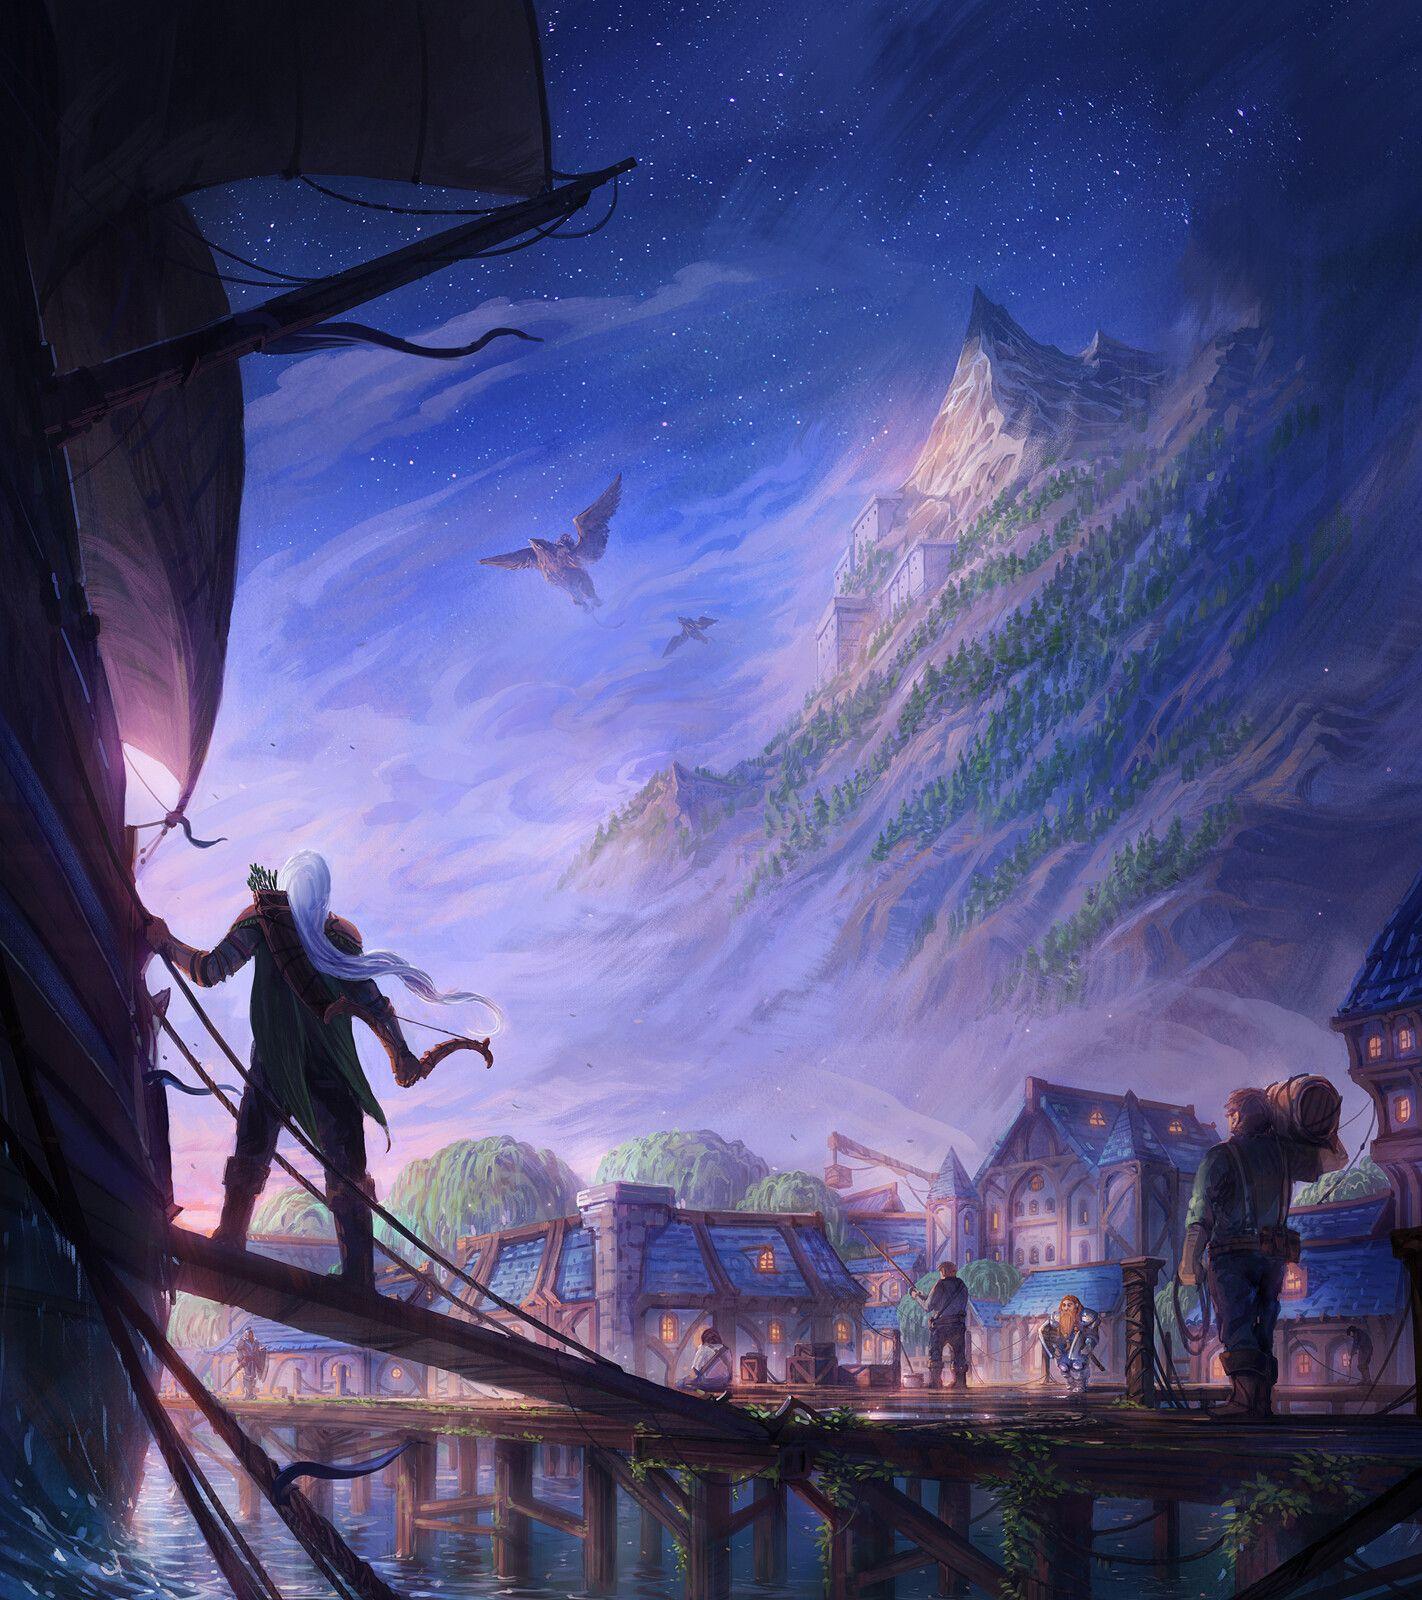 World Of Warcraft Classic Arriving In Menethil Harbor Jorge Jacinto On Artstation At Https Www In 2020 Warcraft Art World Of Warcraft Characters World Of Warcraft